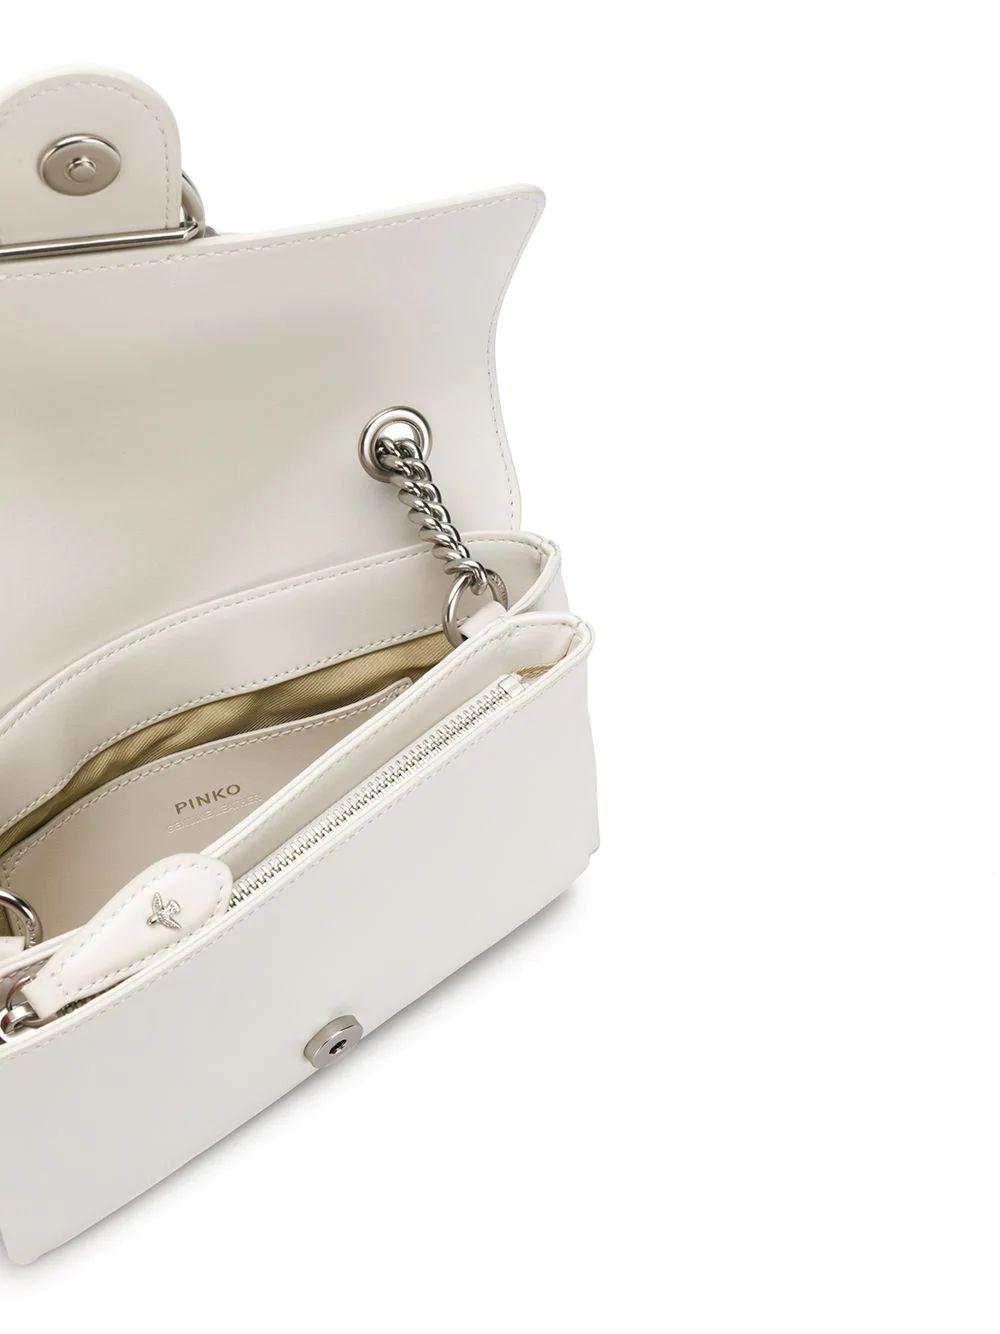 PINKO WOMEN'S 1P21KUY5FFI09 WHITE LEATHER SHOULDER BAG